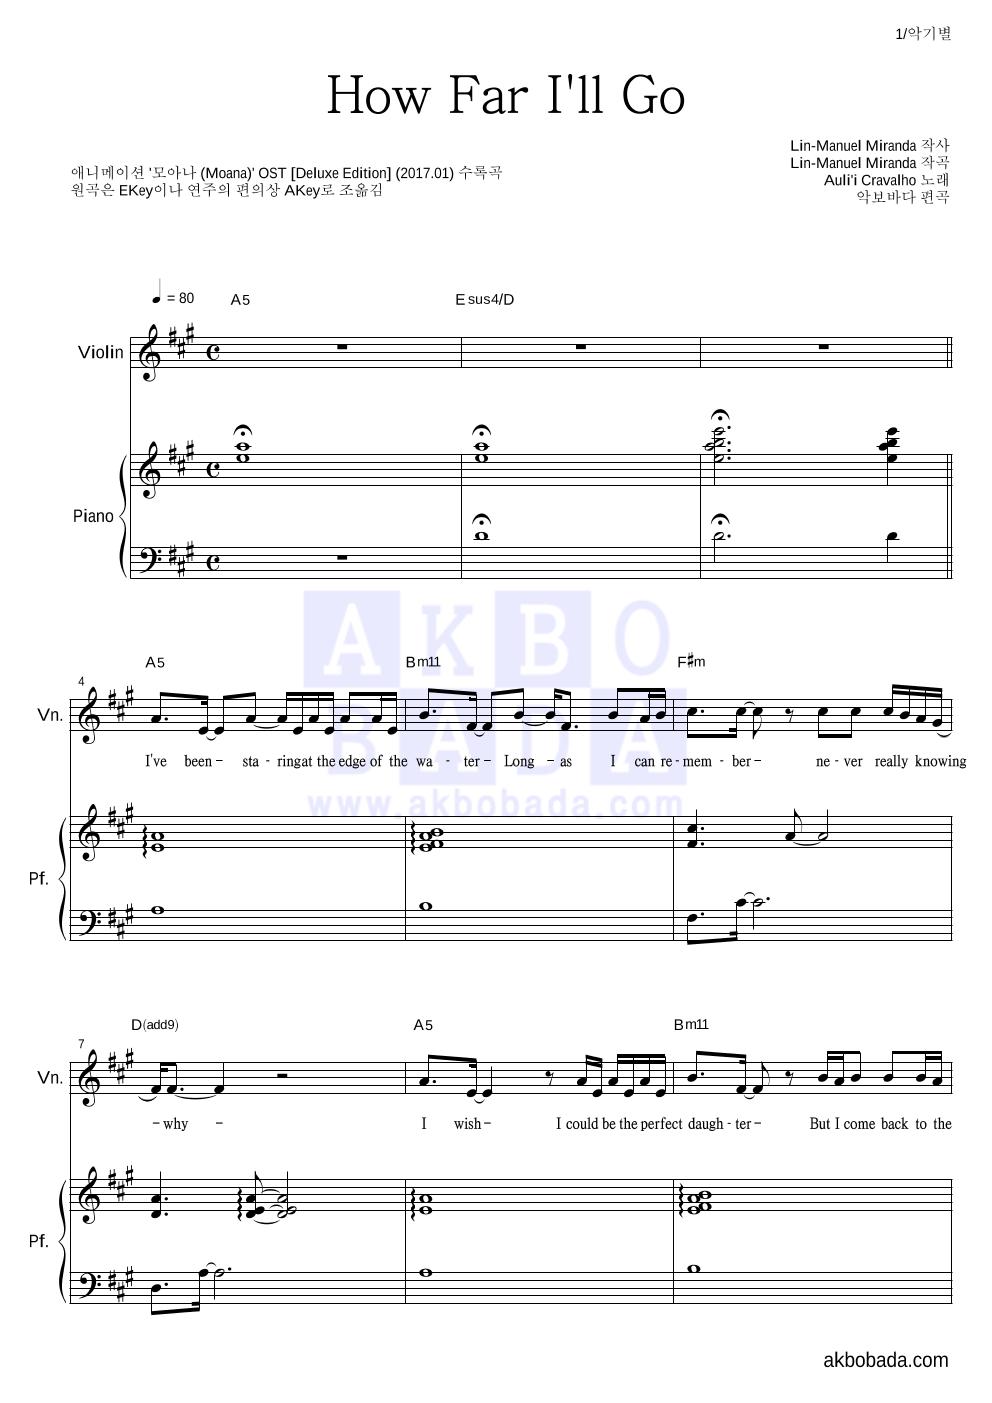 Auli'i Cravalho - How Far I'll Go 바이올린&피아노 악보